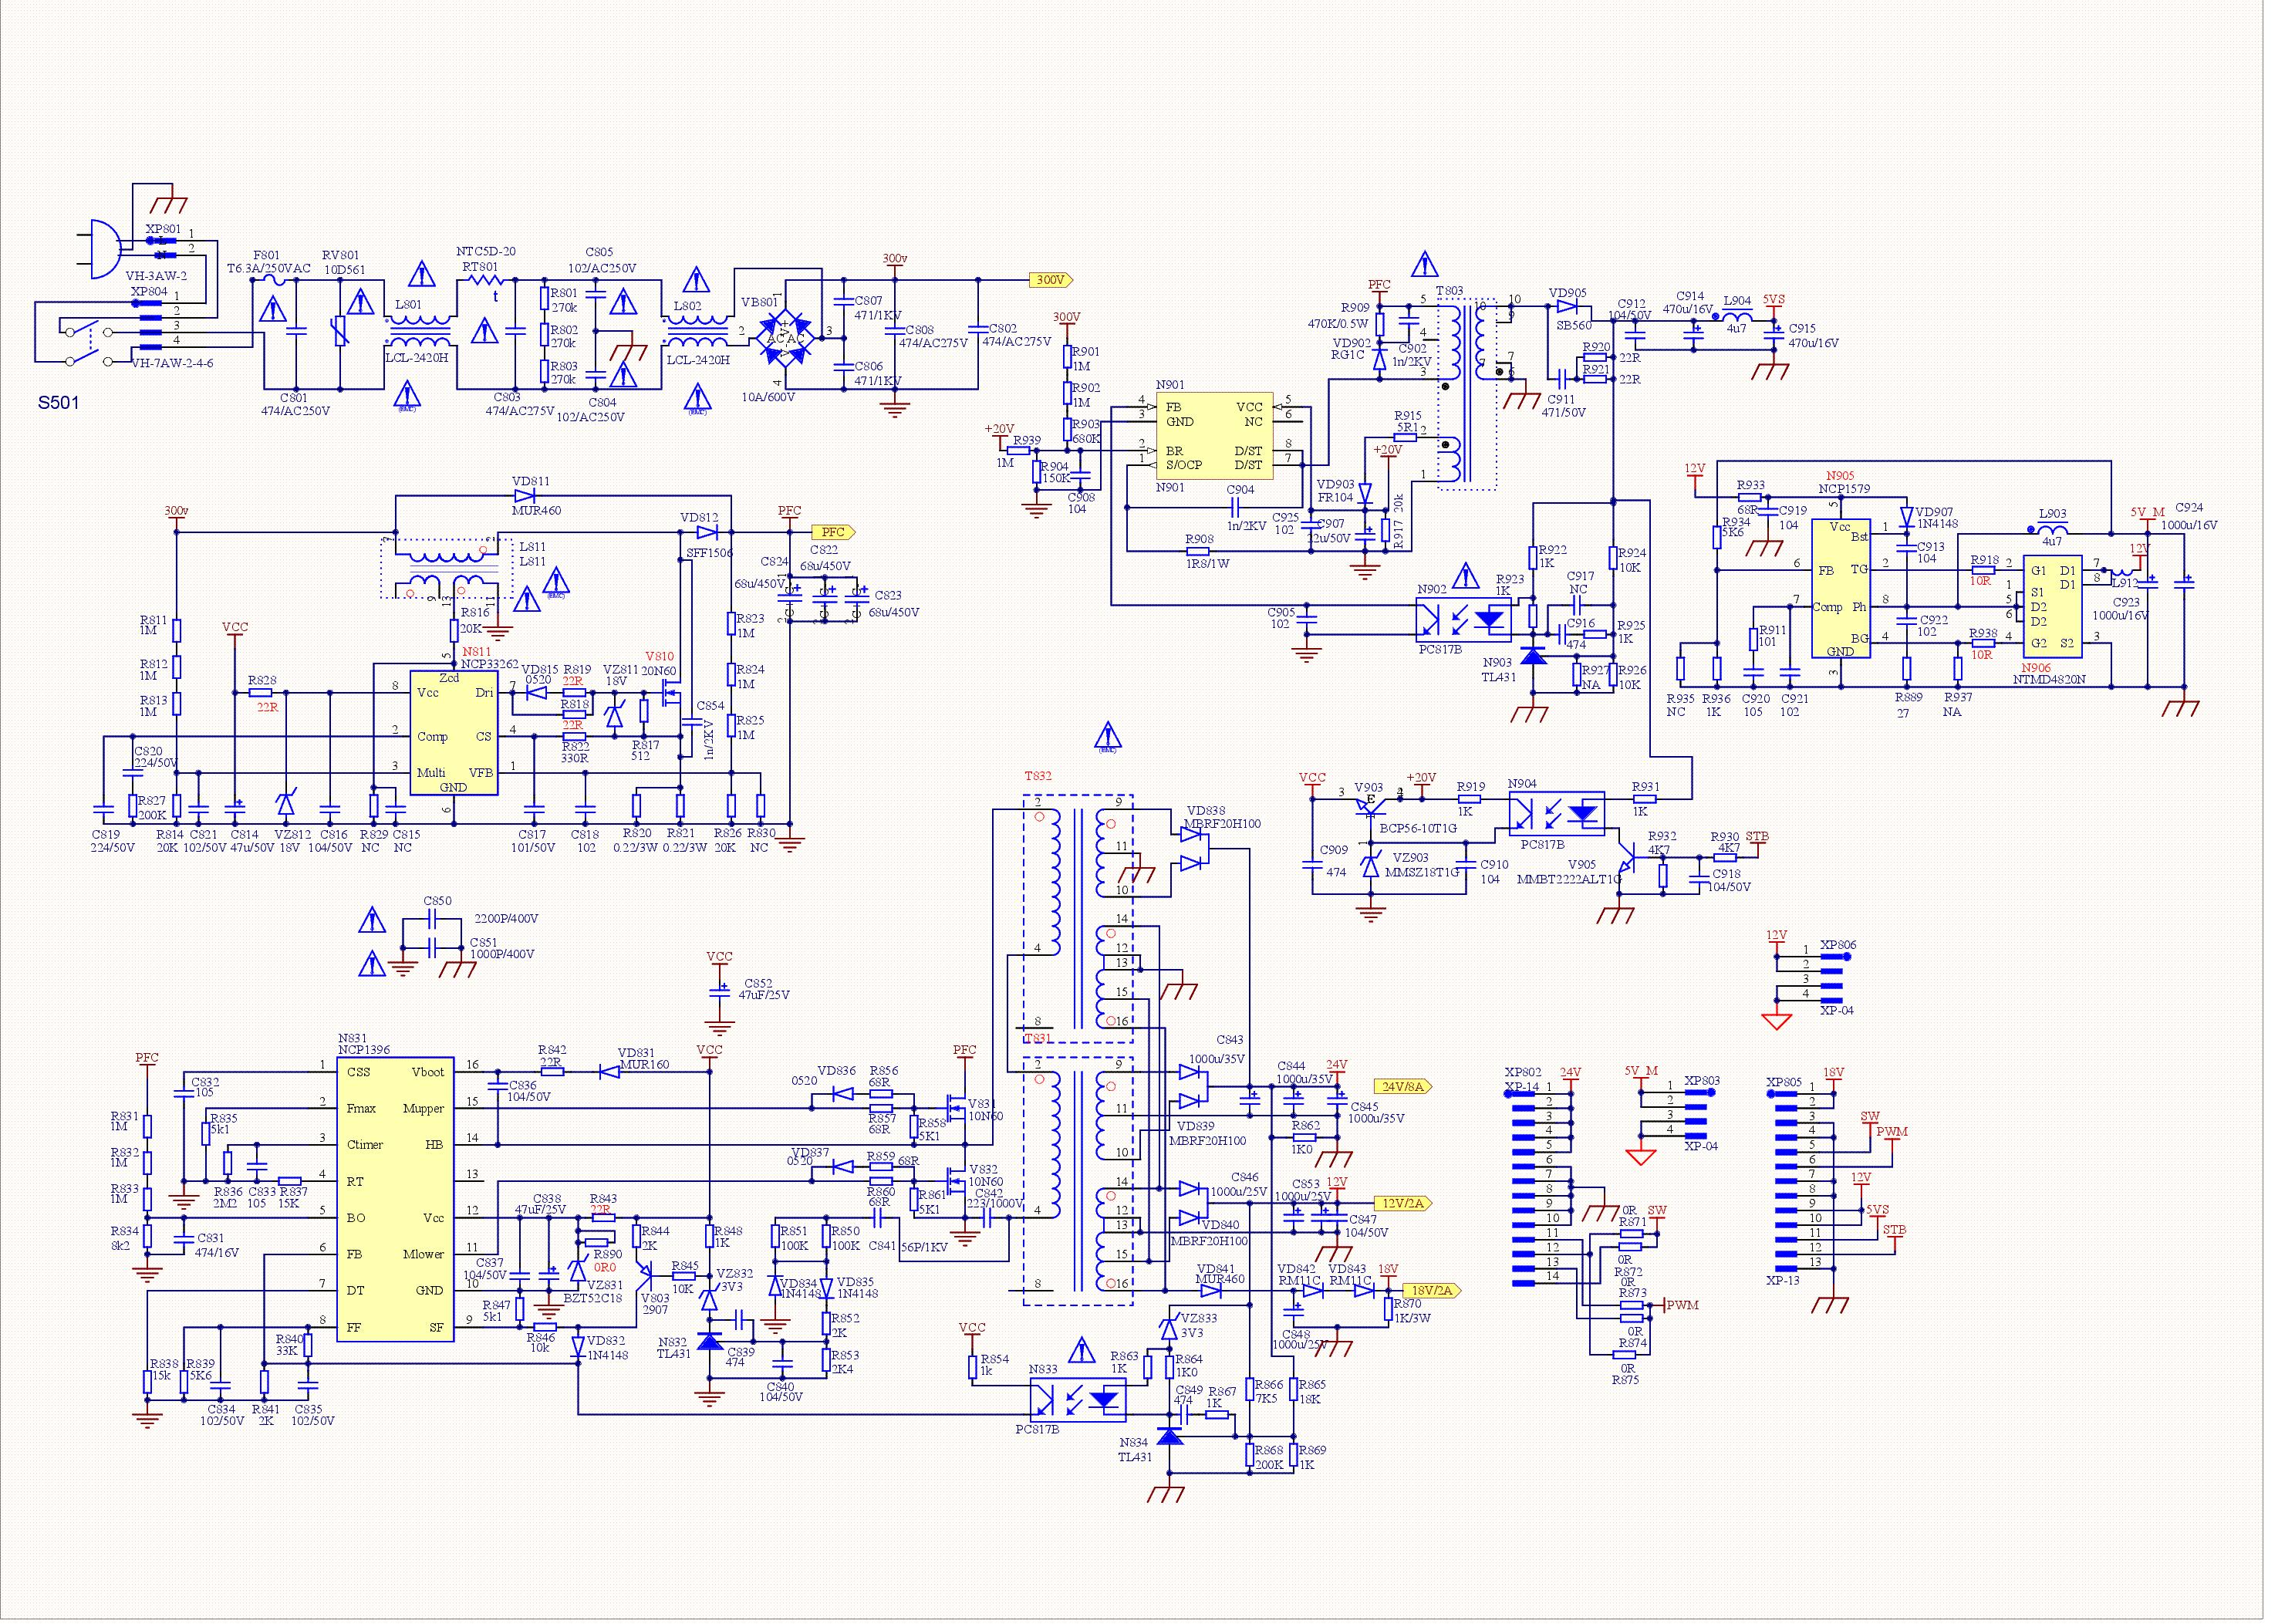 Hisense Rsag7 820 5024 Led Power Supply Sch Service Manual Download  Schematics  Eeprom  Repair